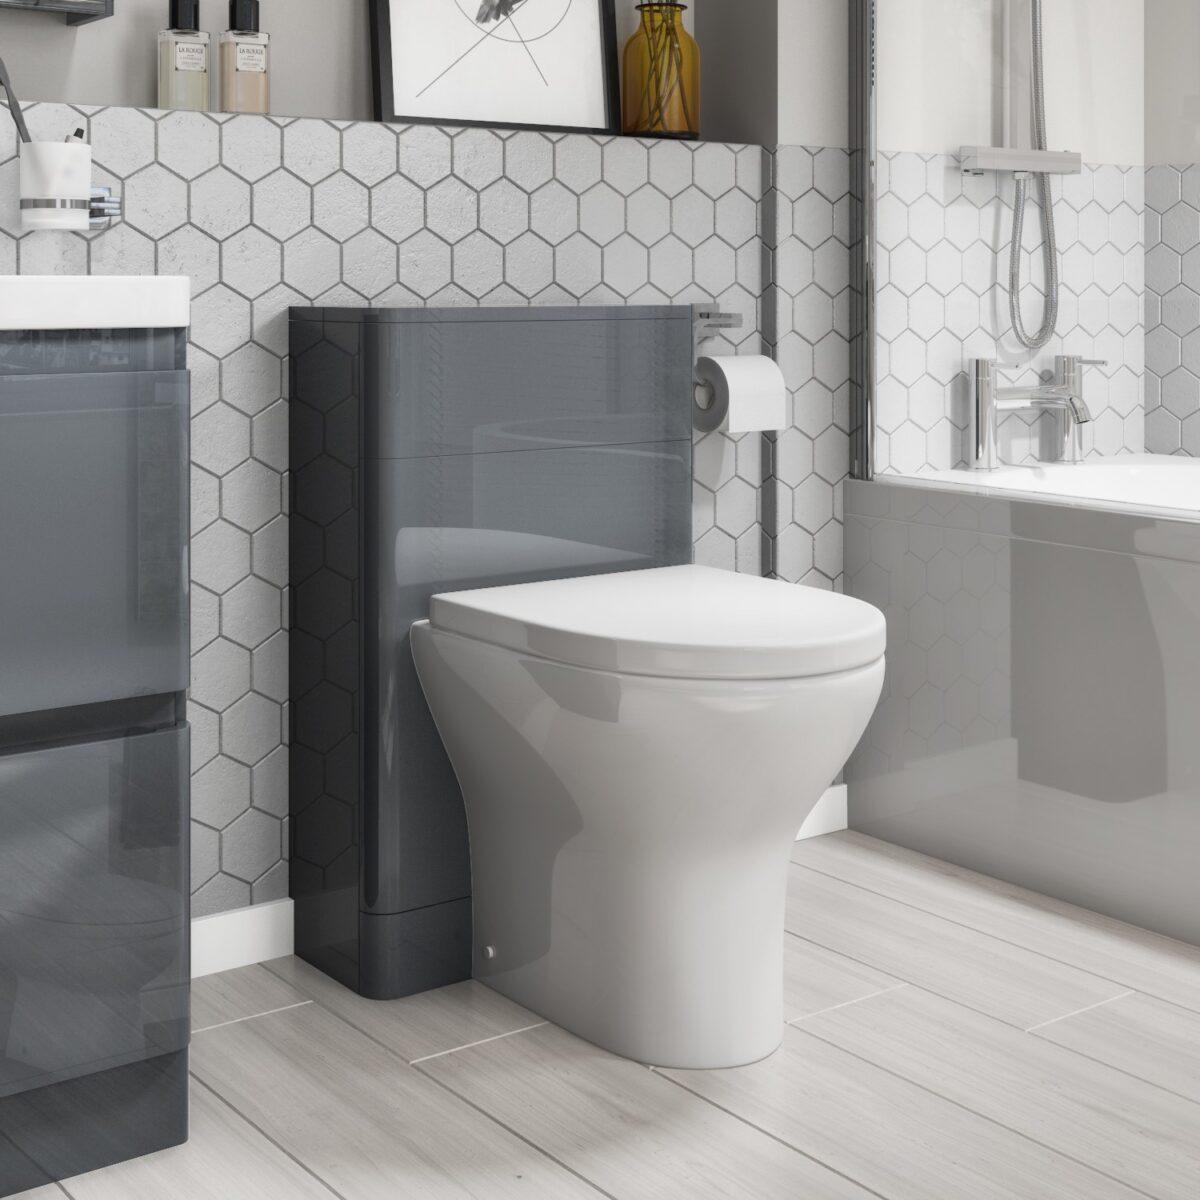 wc-cassetta-esterna-design-5